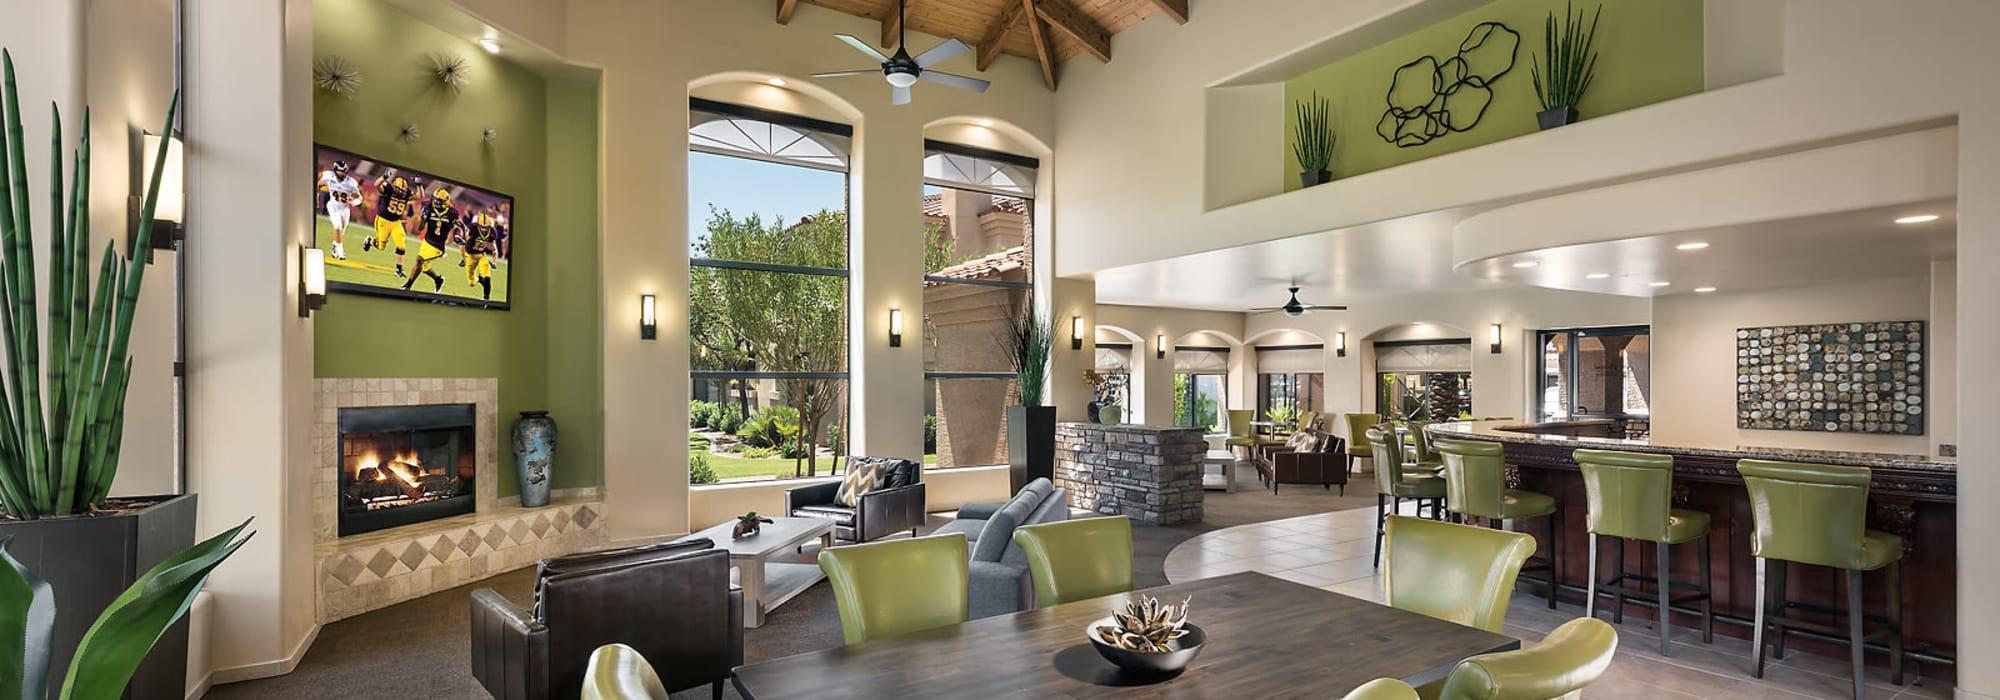 Luxurious resident clubhouse interior at San Pedregal in Phoenix, Arizona